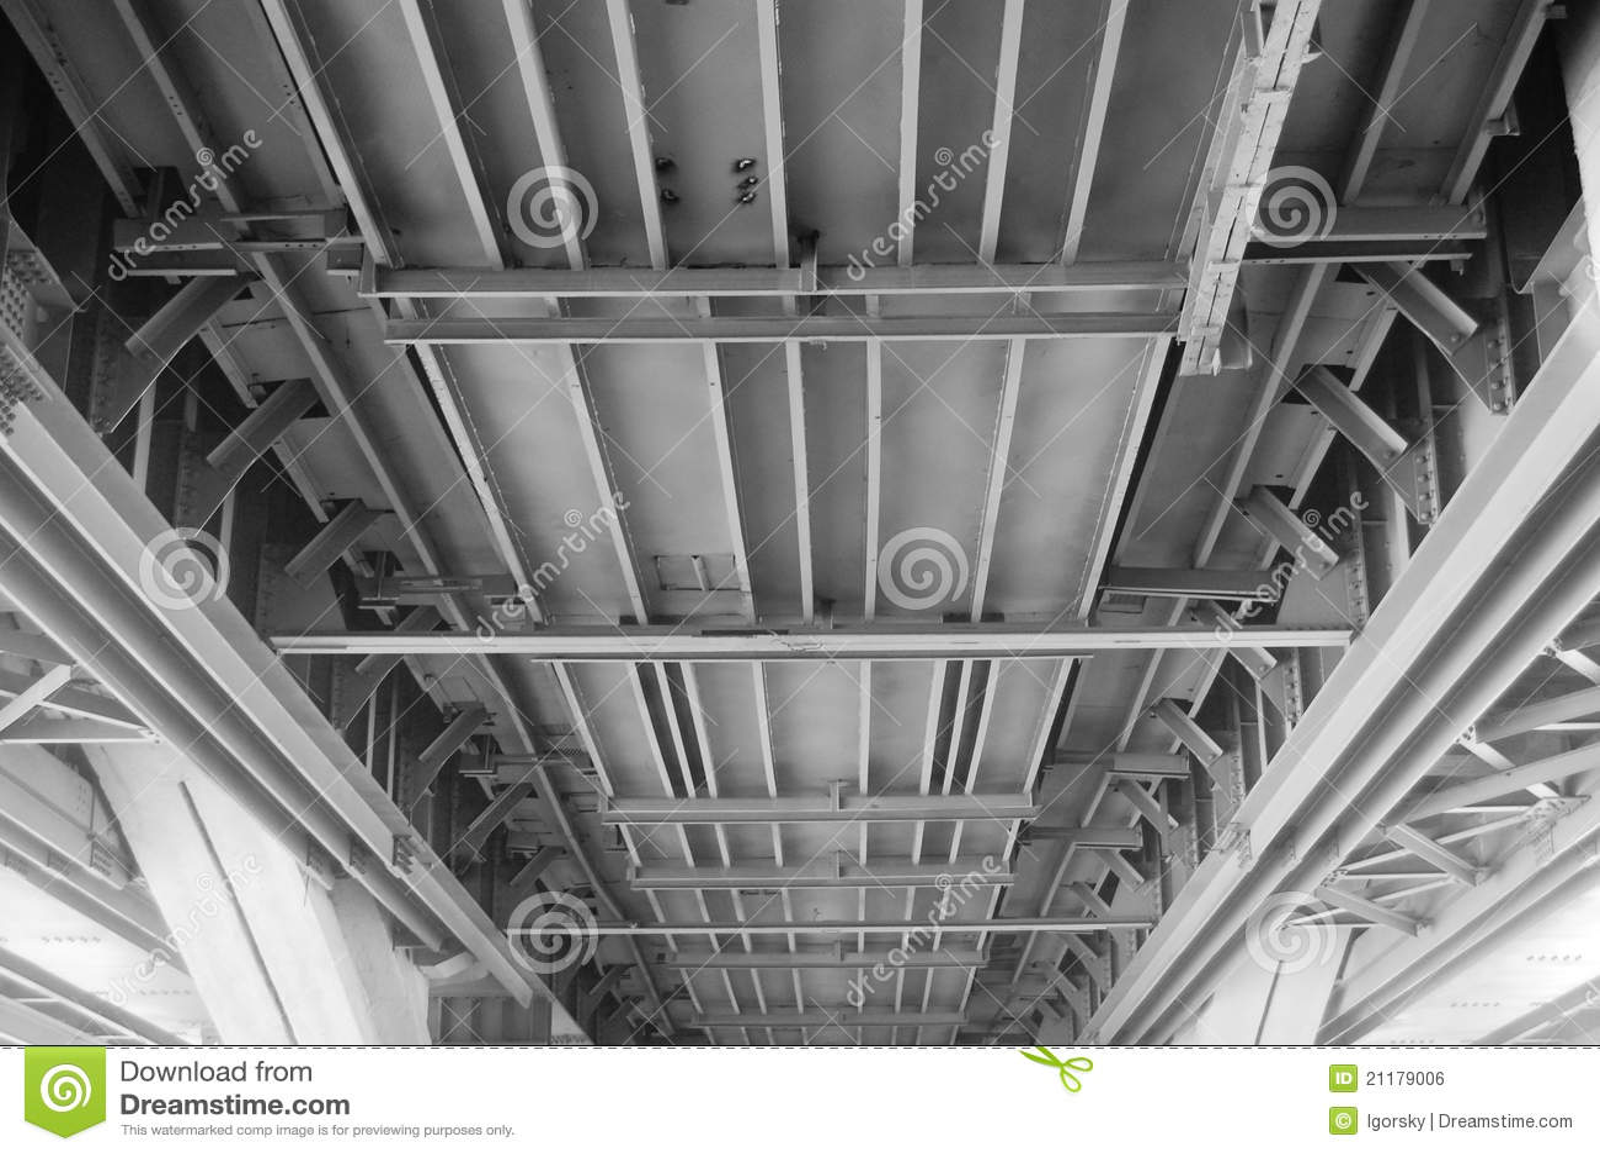 Close-up , bridge frame